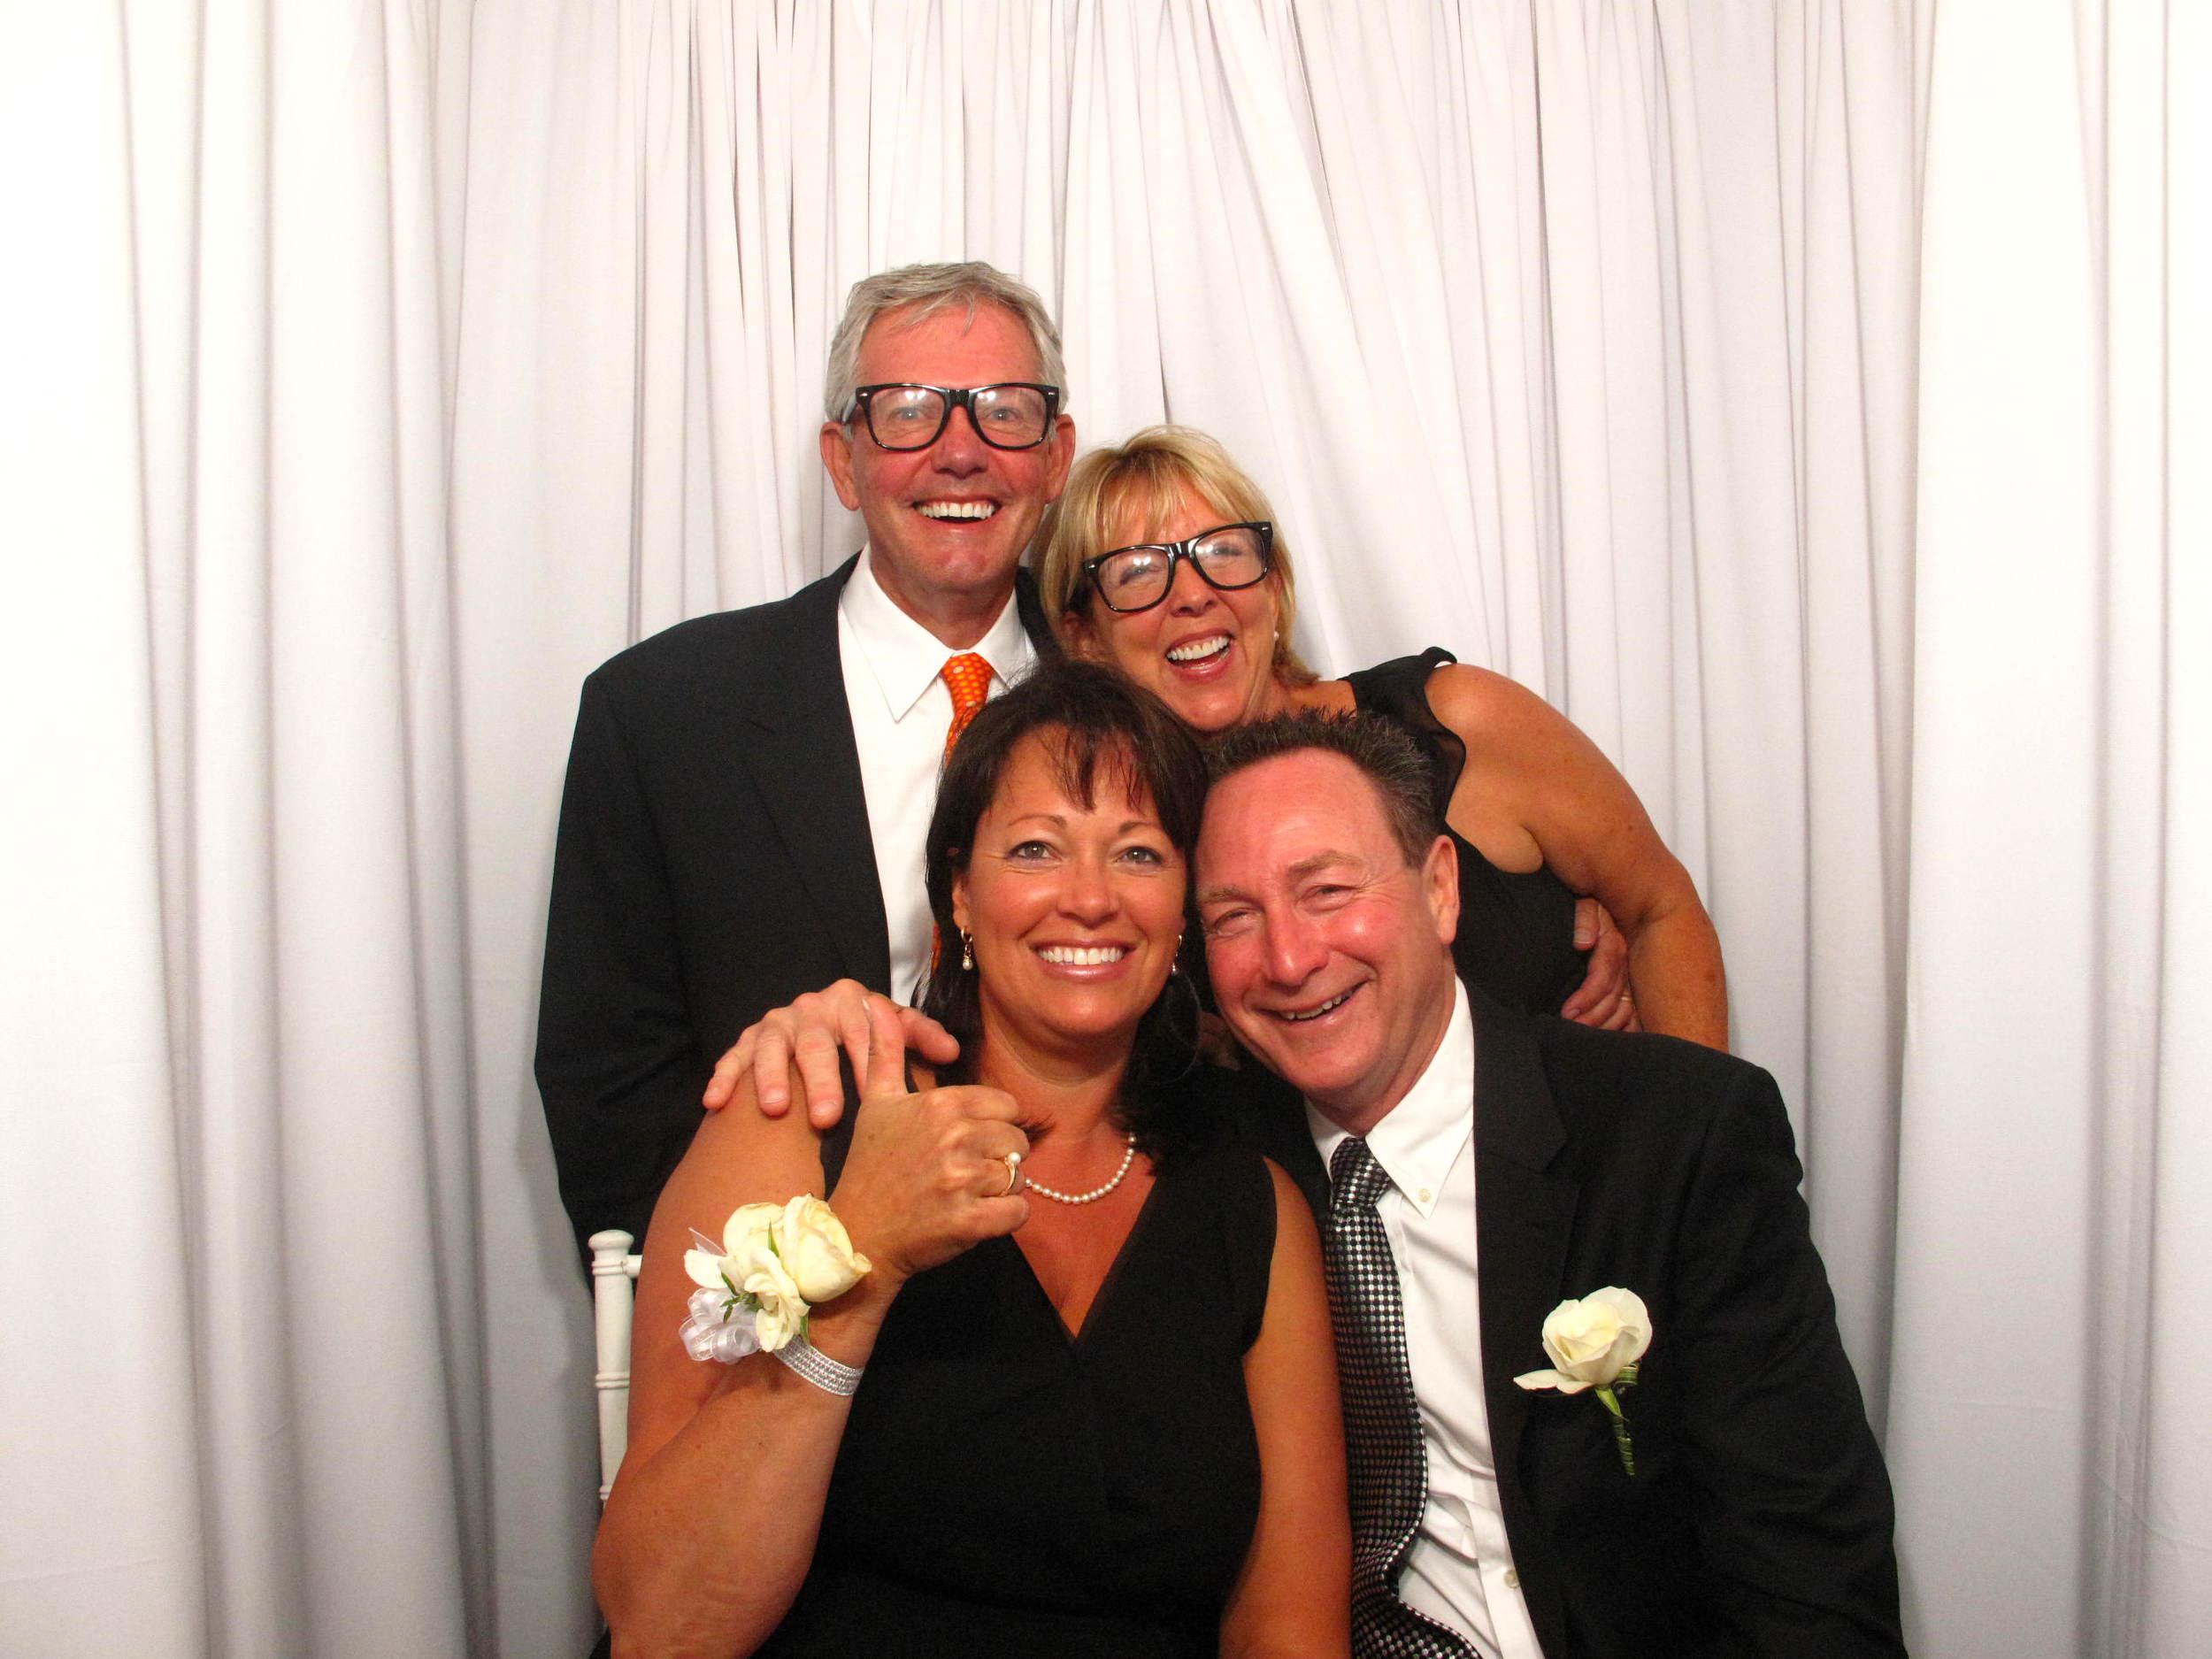 Snapshot Photobooths at Baltusrol Golf Club